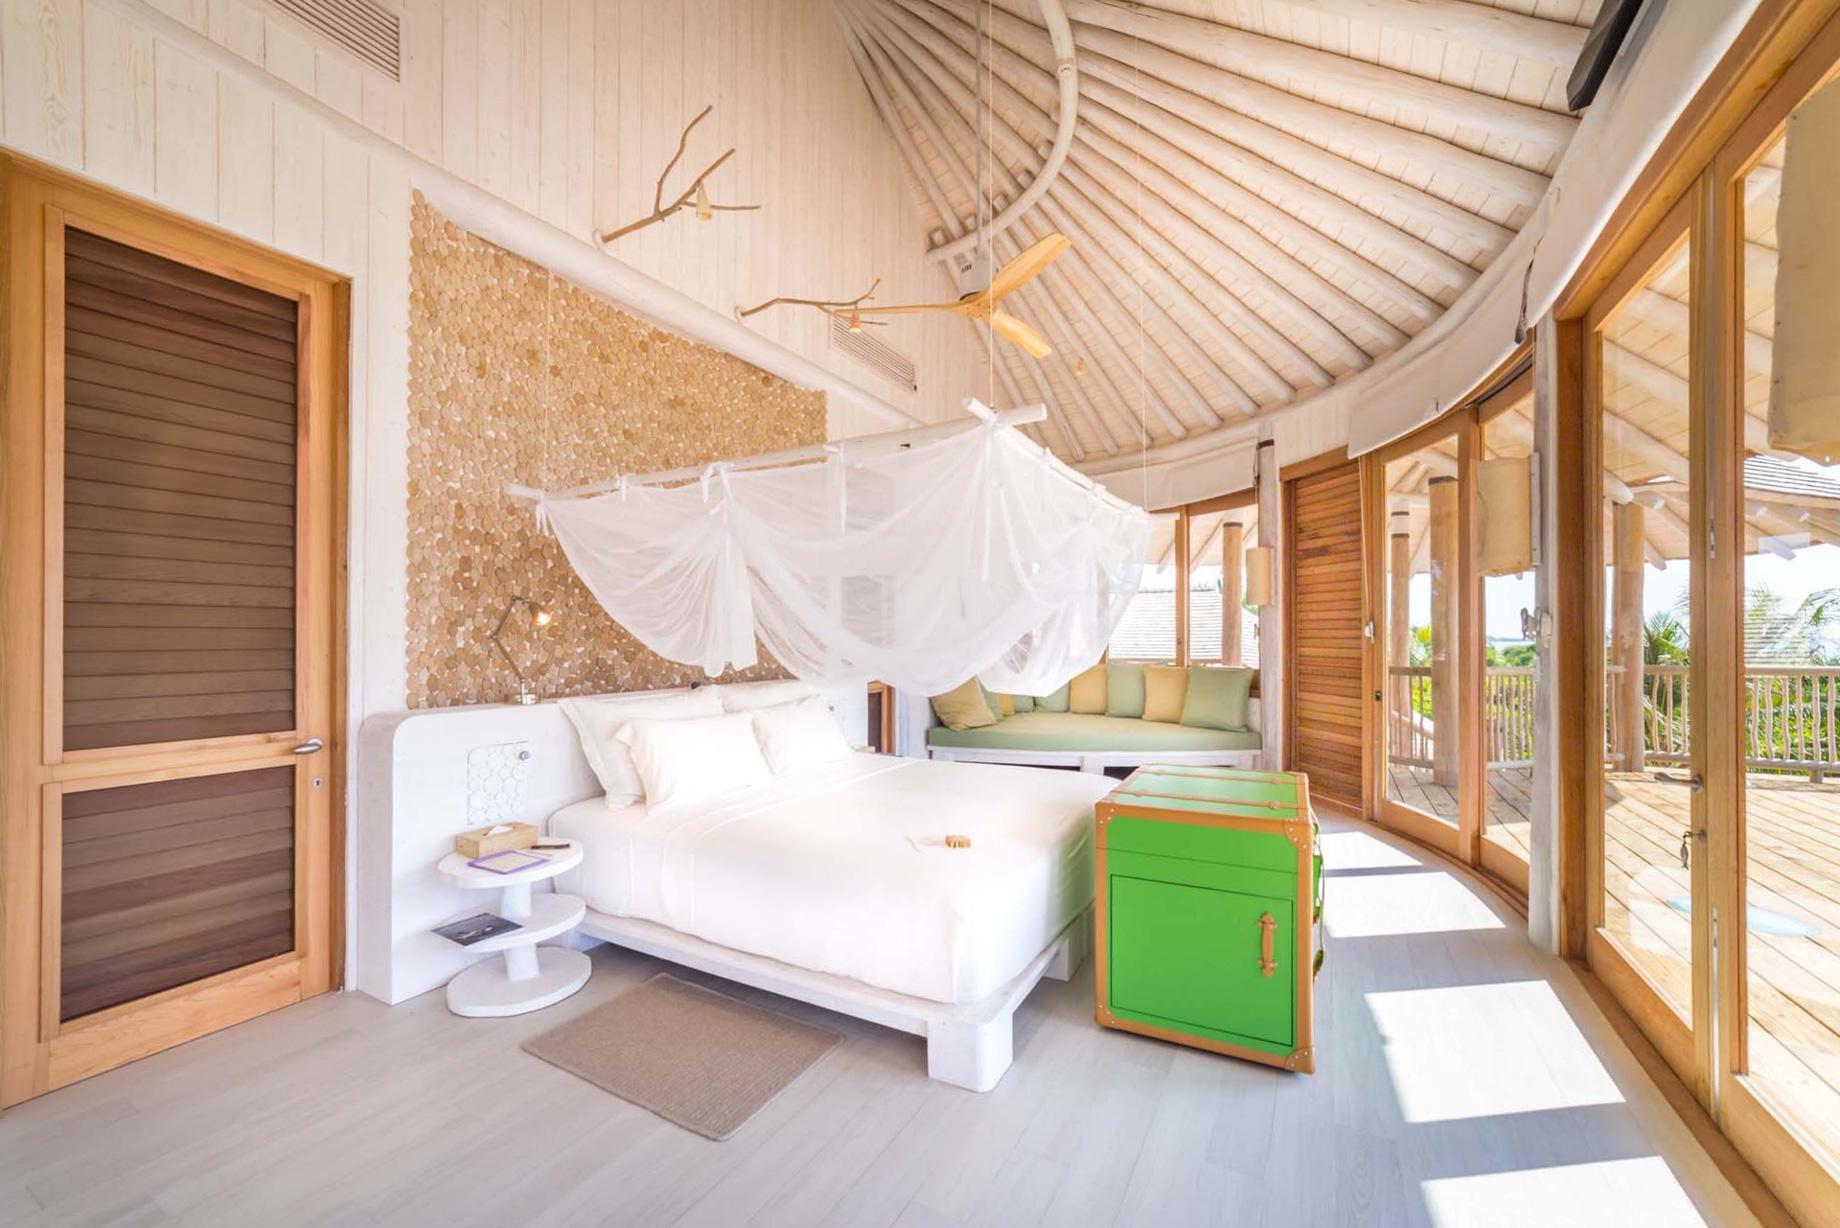 Soneva Jani Luxury Resort – Noonu Atoll, Medhufaru, Maldives – 3 Bedroom Island Reserve Villa Bedroom